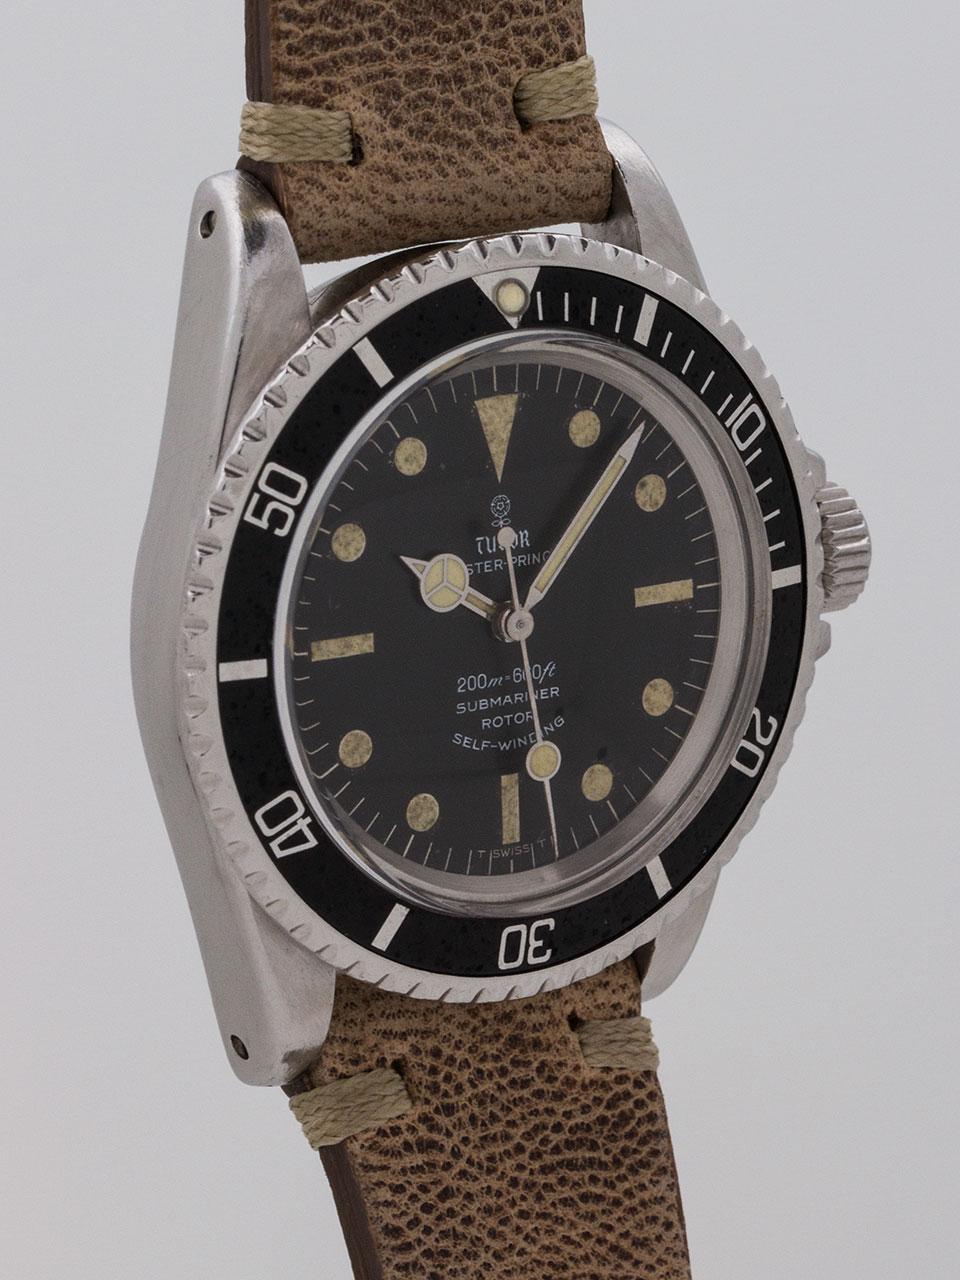 Tudor ref 7928 Submariner Stainless Steel circa 1967